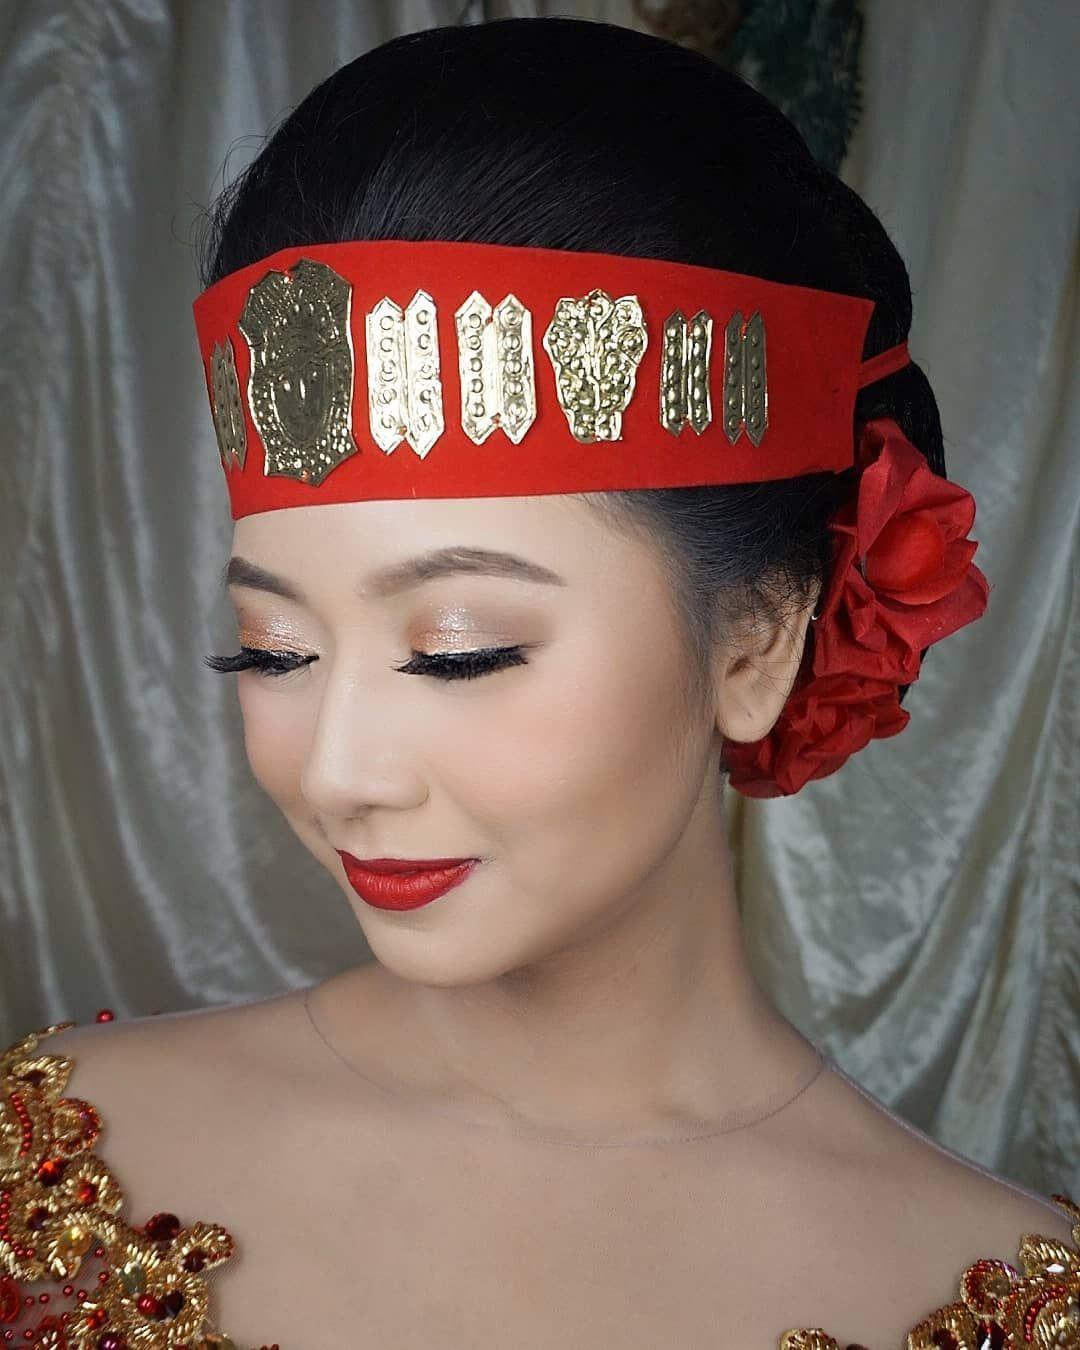 Pengantin Batak Toba Indirasaras Make Up Npumakeup Hair Do Kebaya Mamiemanten Studio Shafana Studio Photographer Mamie Photo In 2020 Fashion Crown Jewelry Crown